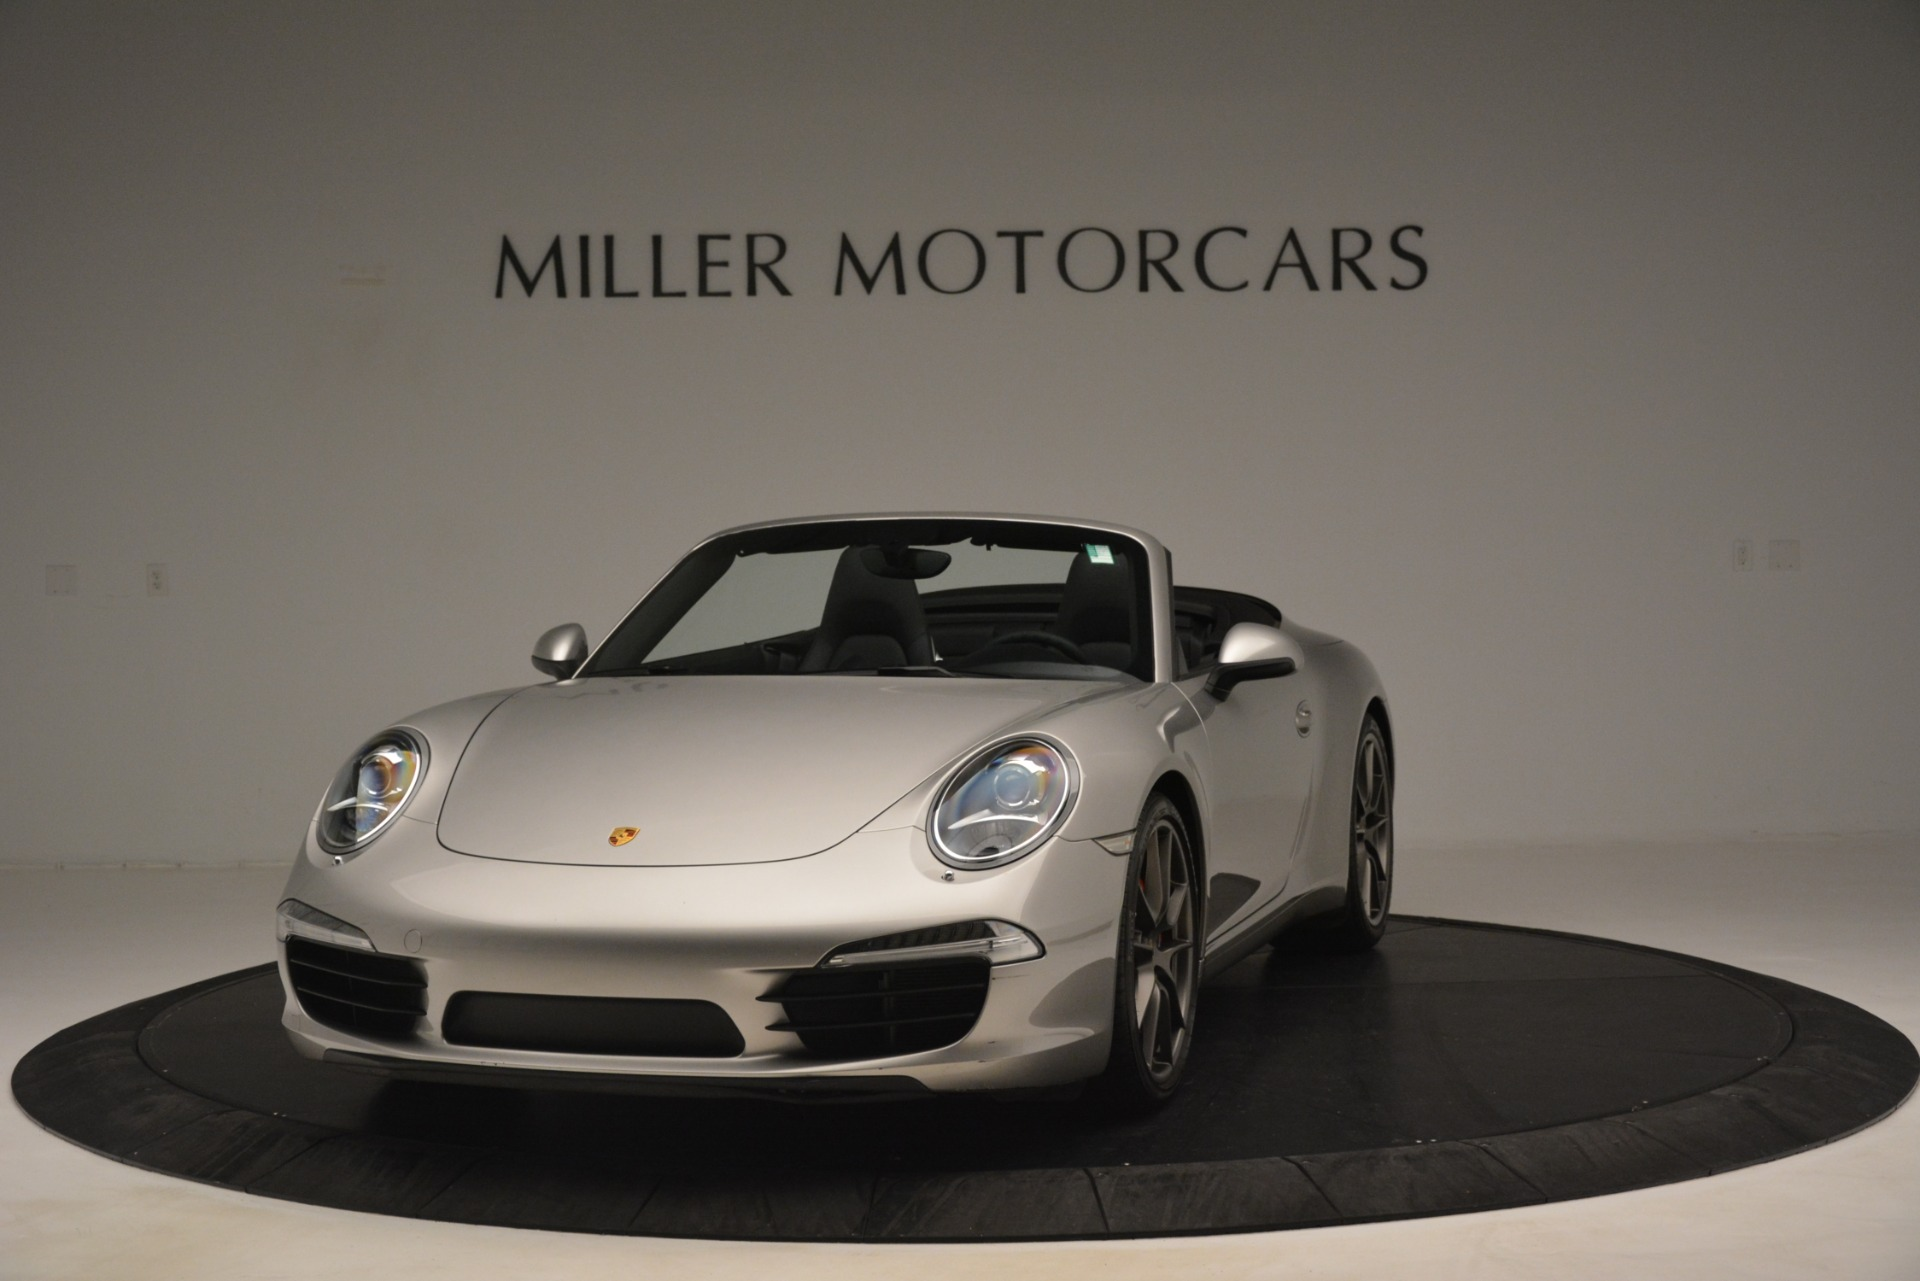 Used 2013 Porsche 911 Carrera S for sale Sold at Alfa Romeo of Greenwich in Greenwich CT 06830 1